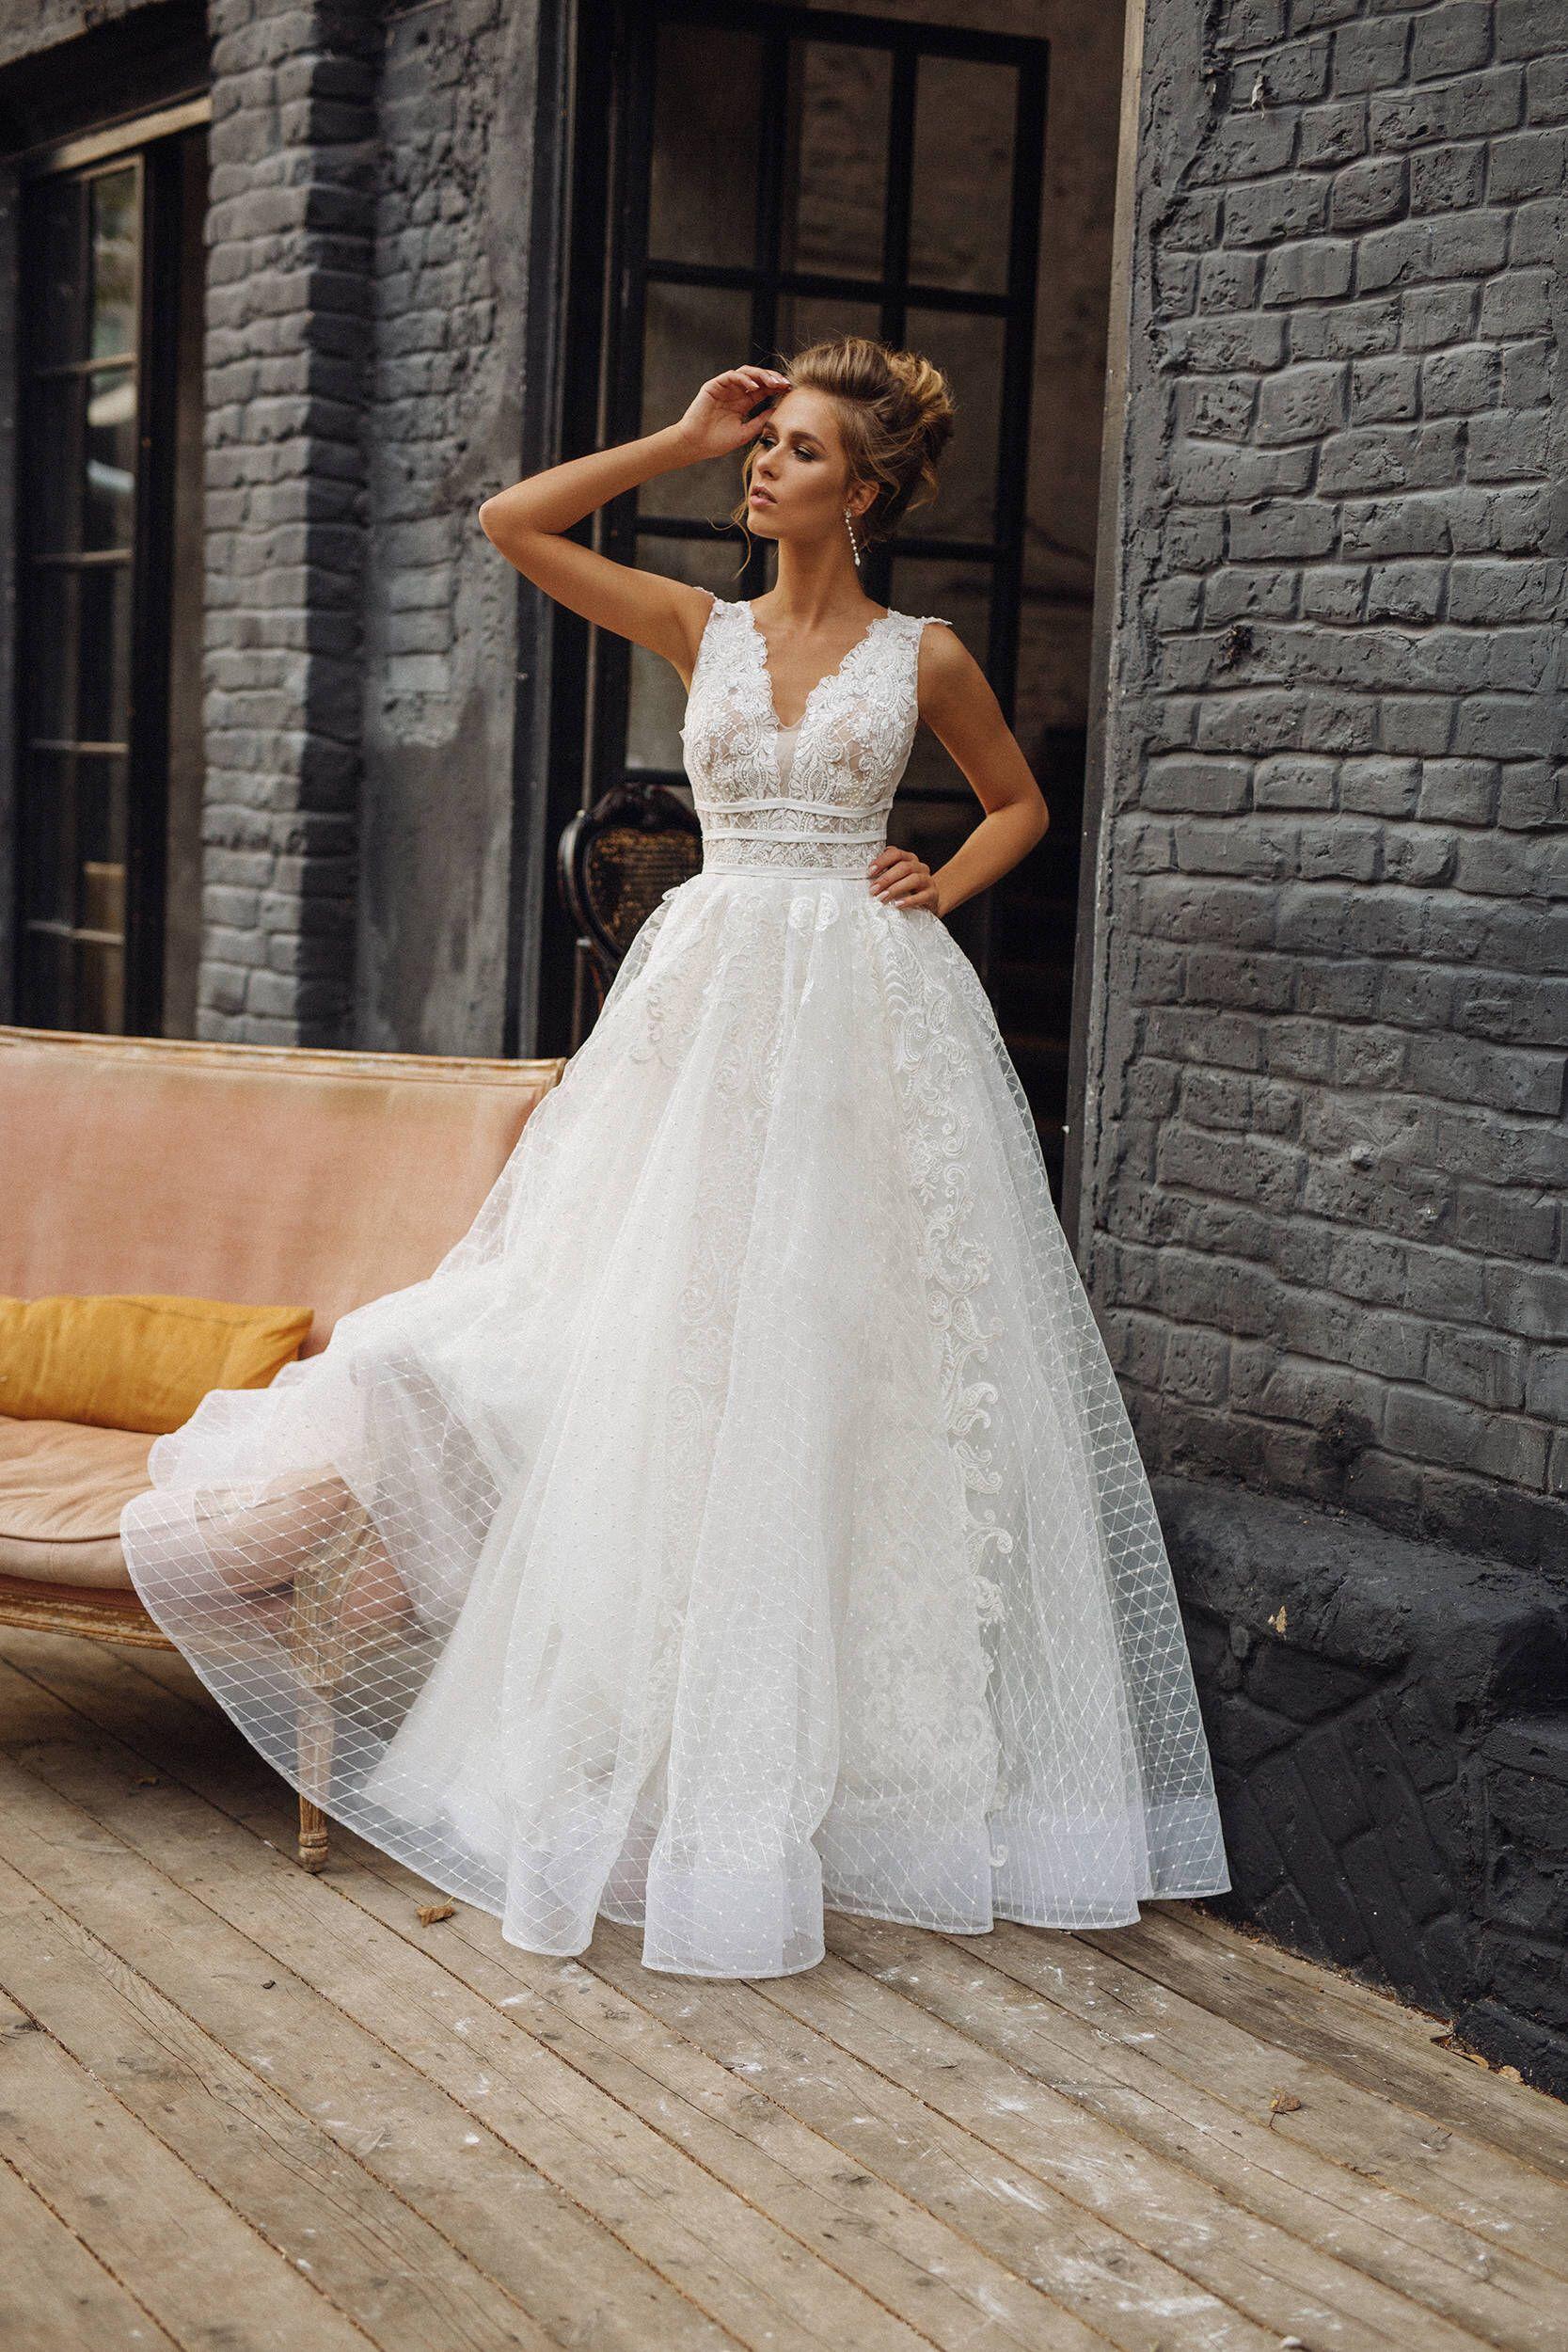 Wedding Dress Milana Full Lace Wedding Dress V Neck V Back Lace Skirt Sleeveless Princess Wedding Dress Etsy Wedding Dress Wedding Dresses Unique Dream Wedding Dresses [ 2500 x 1667 Pixel ]